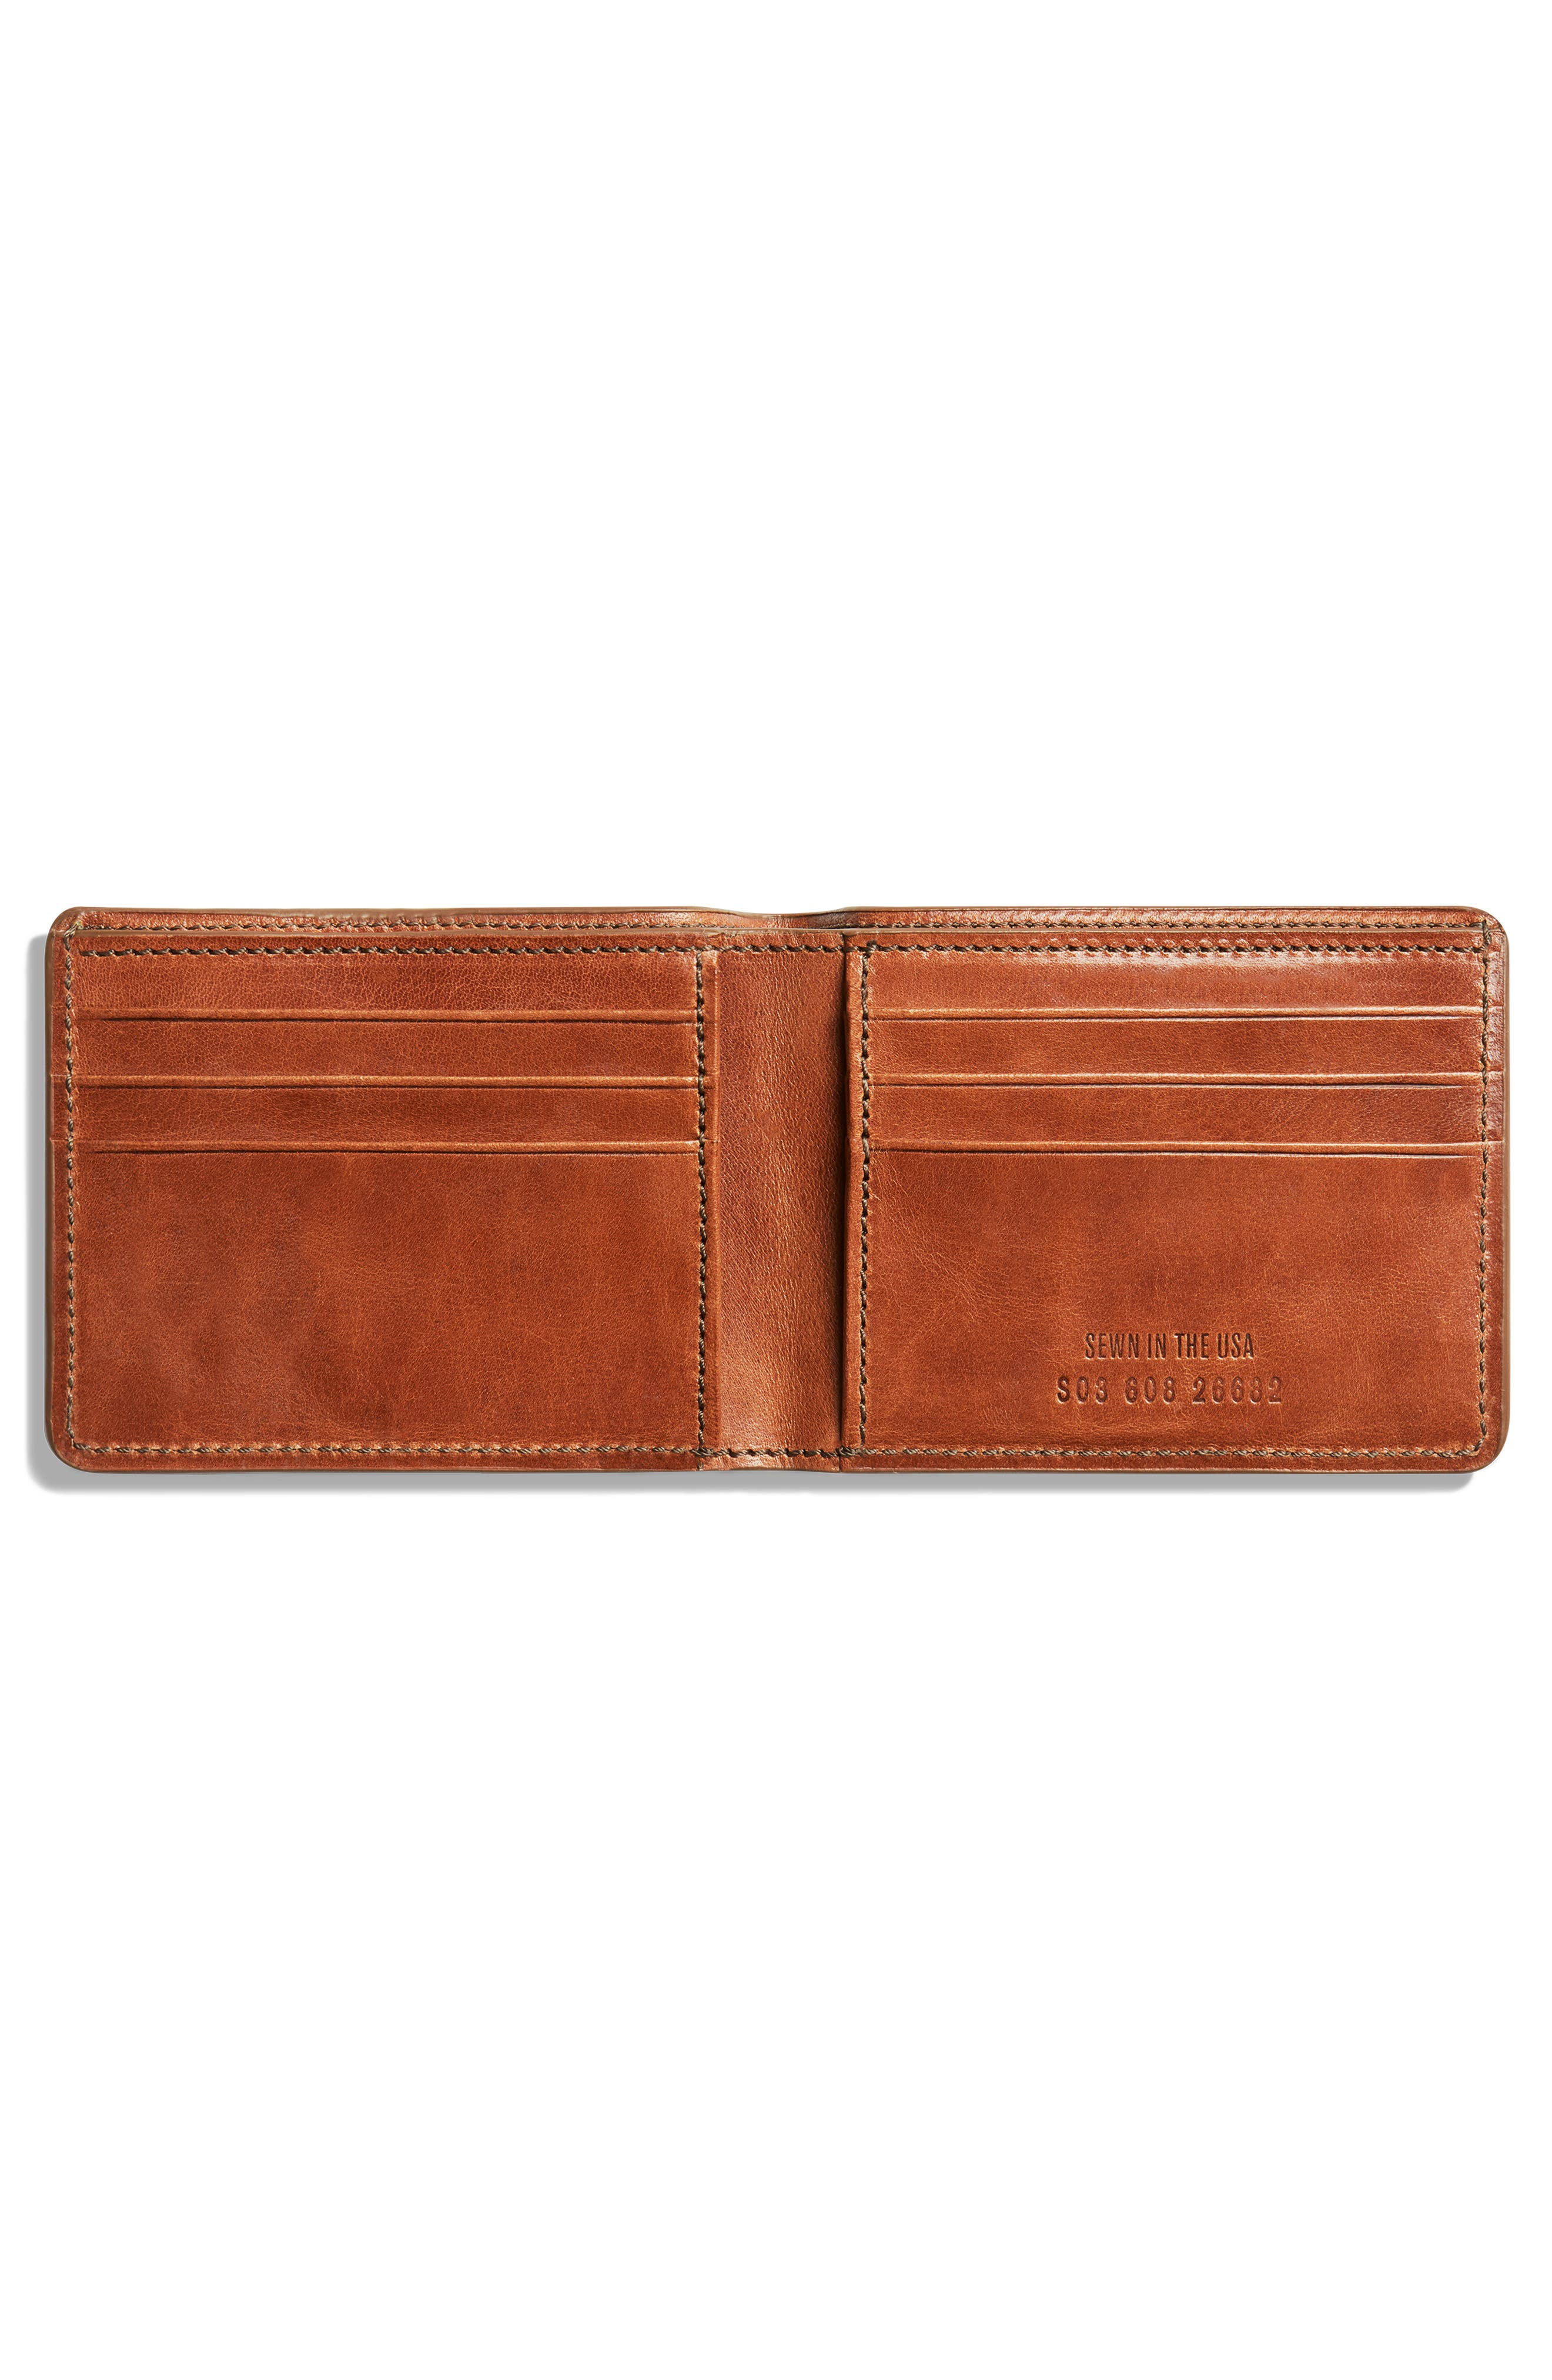 Harness Slim 2.0 Bifold Leather Wallet,                             Alternate thumbnail 2, color,                             BOURBON